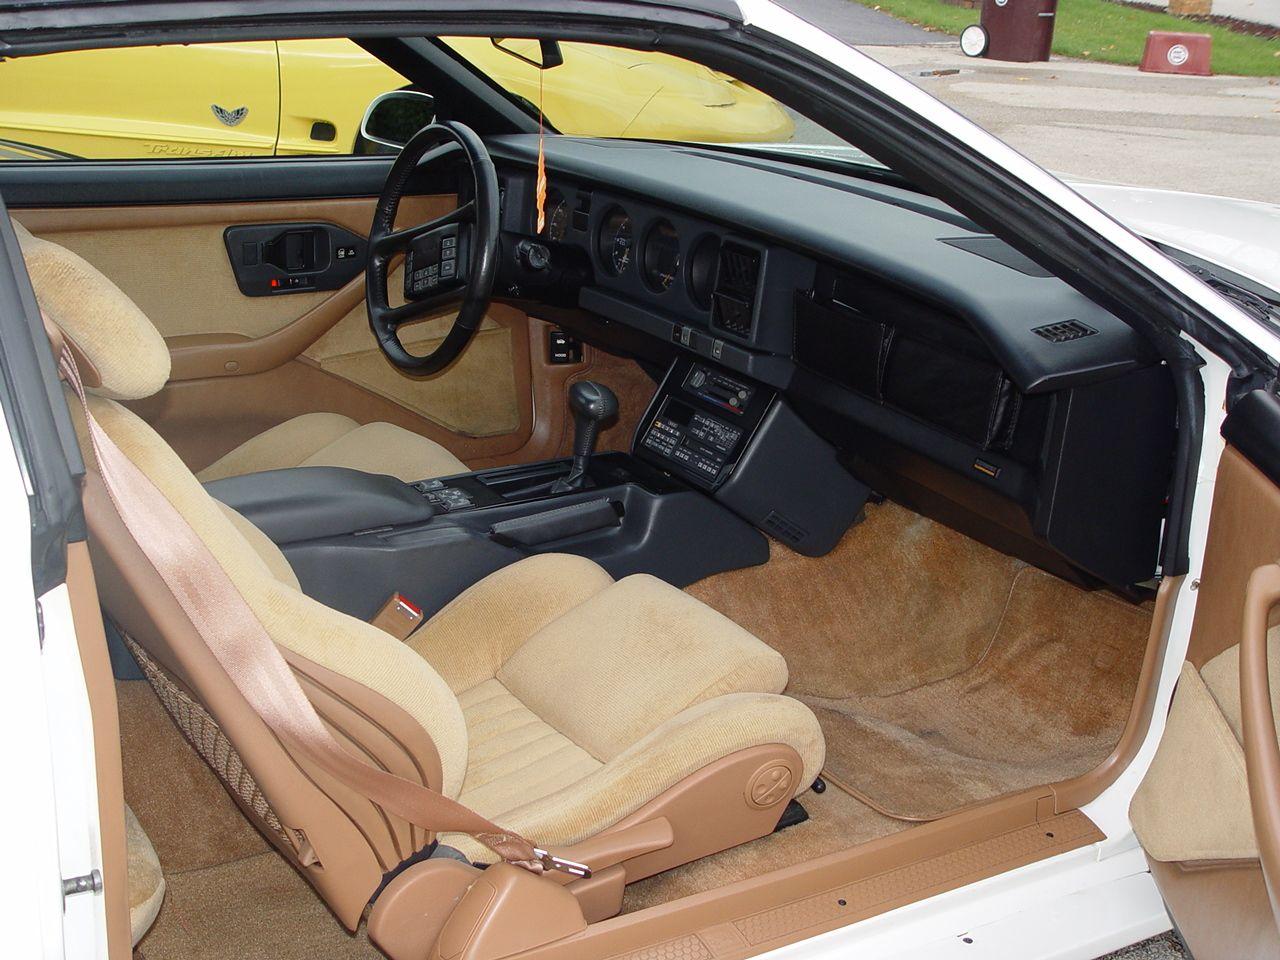 1989 Turbo Trans Am Interior Festival Car 99